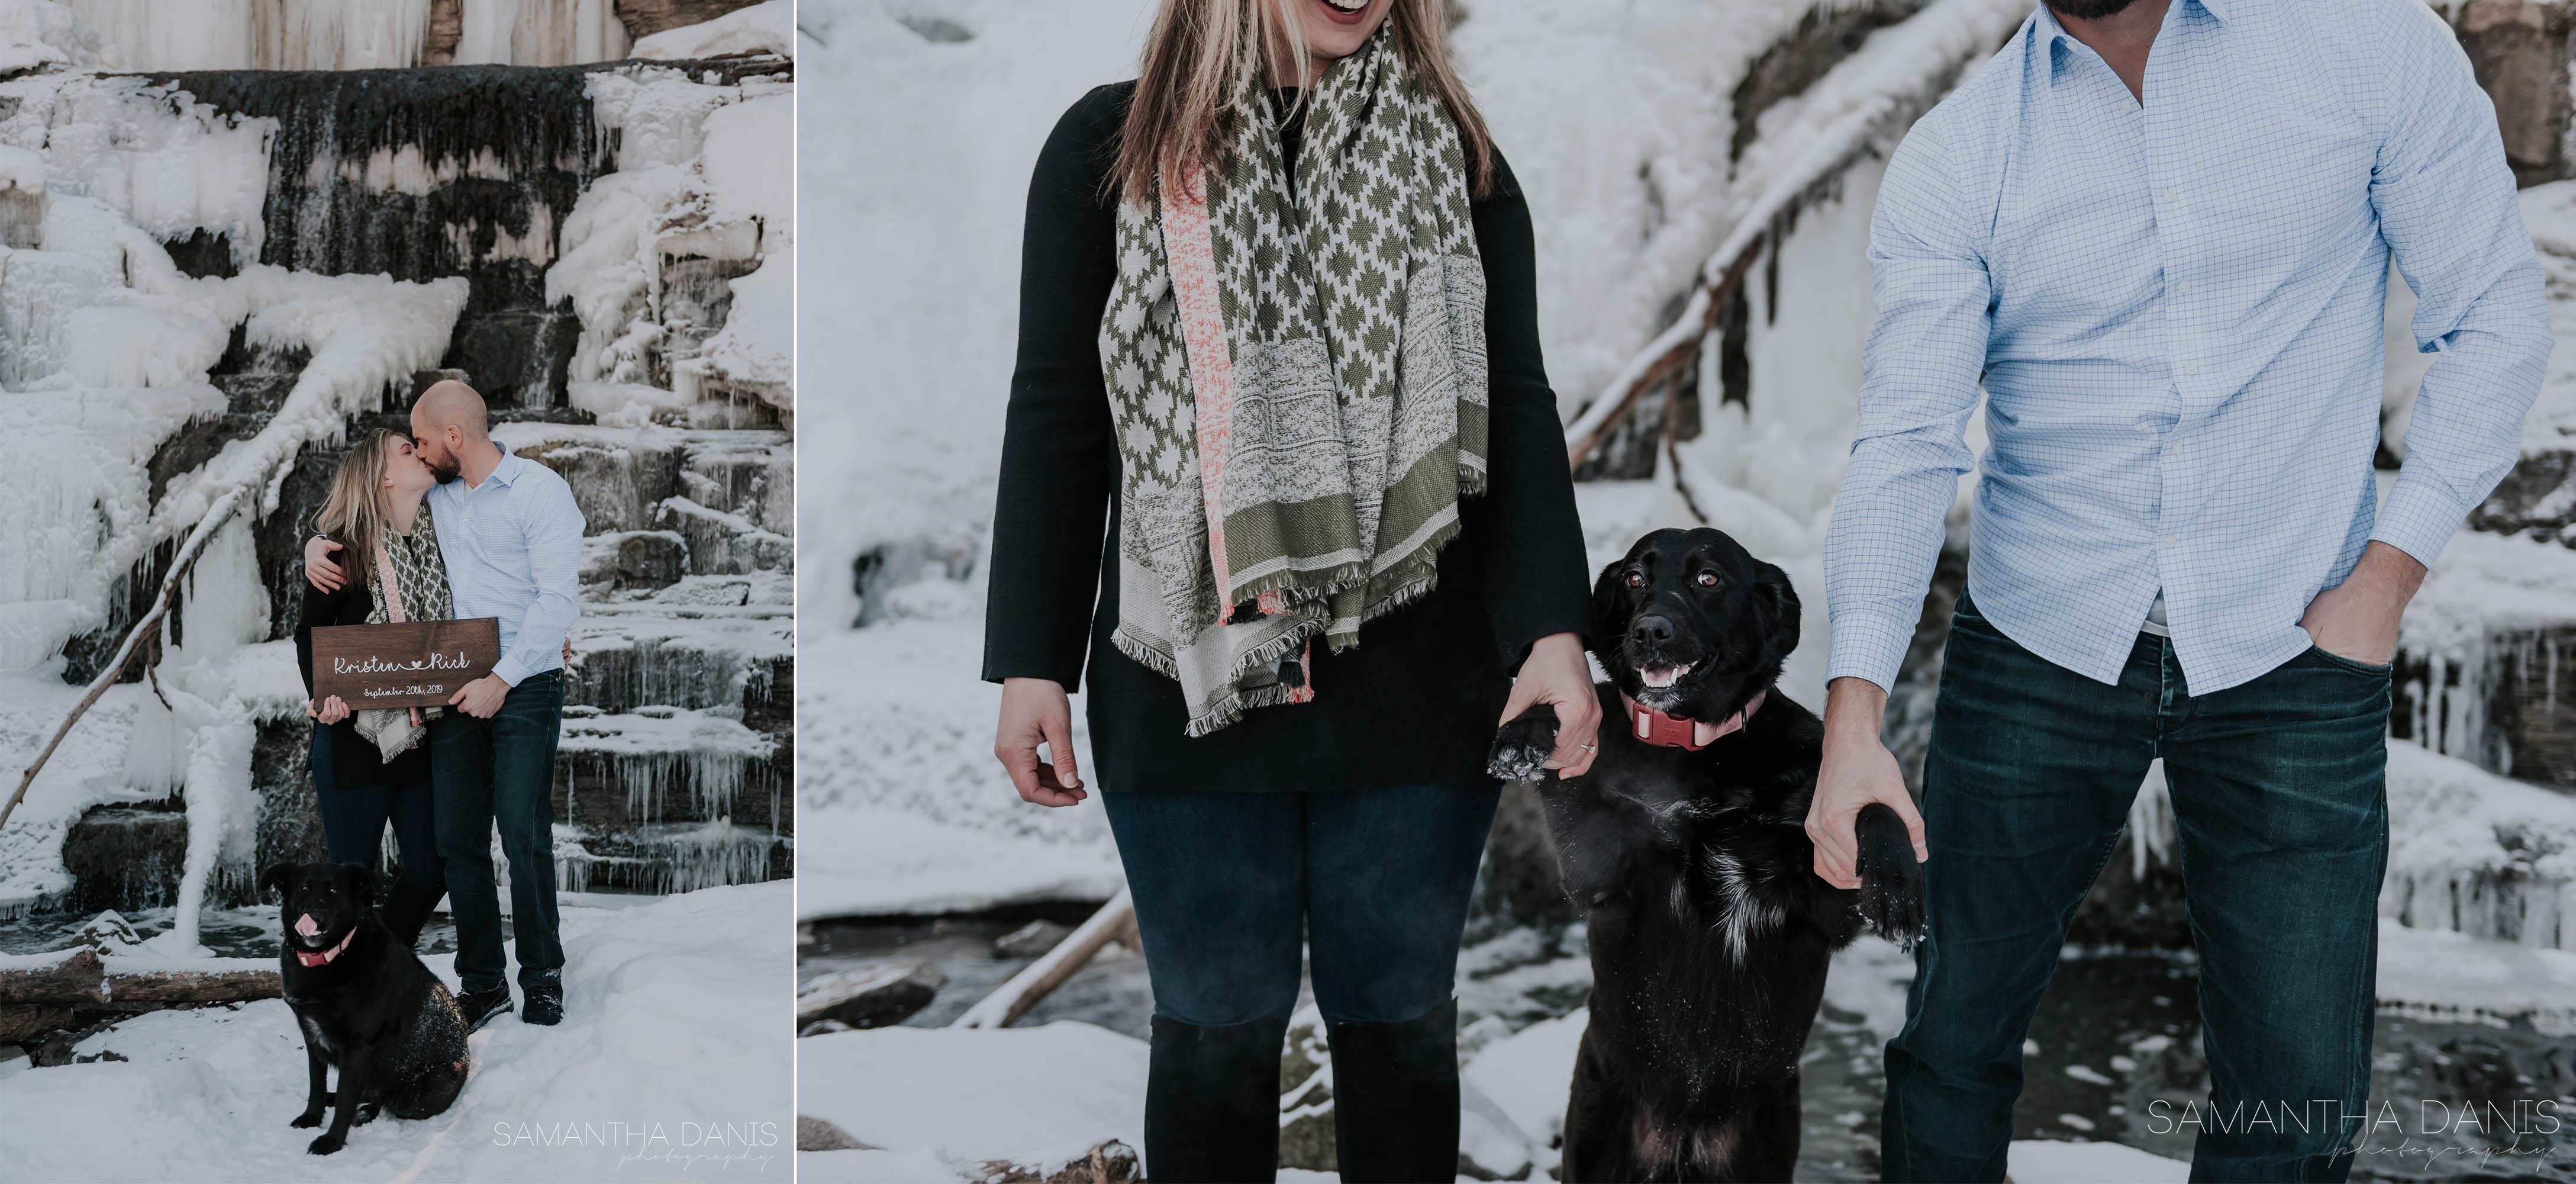 ottawa winter engagement samantha danis photography ottawa photographer